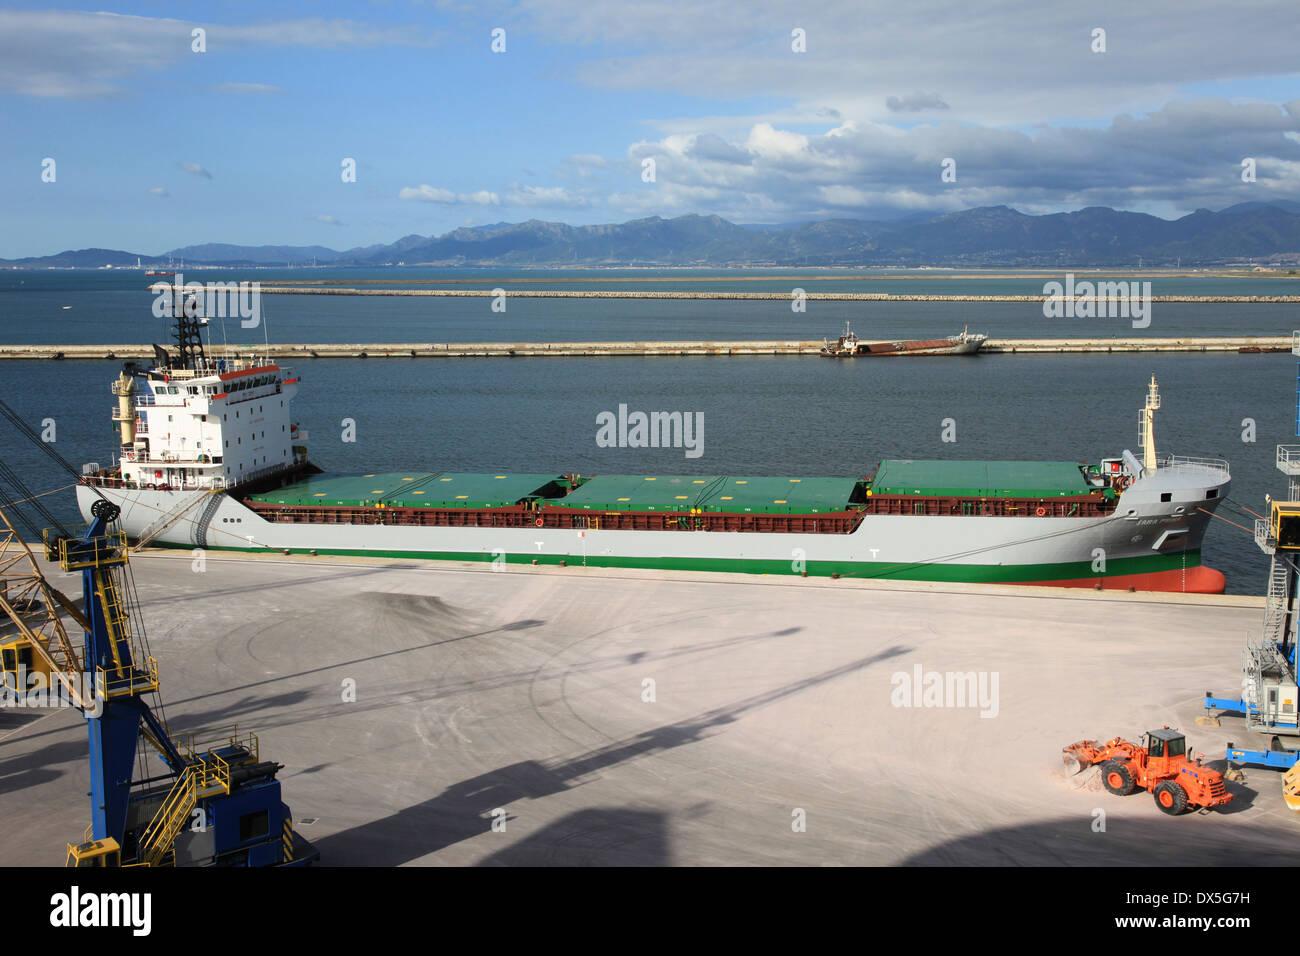 Italian general cargo ship SARA PRIMA docked in Cagliari Sardinia Italy - Stock Image